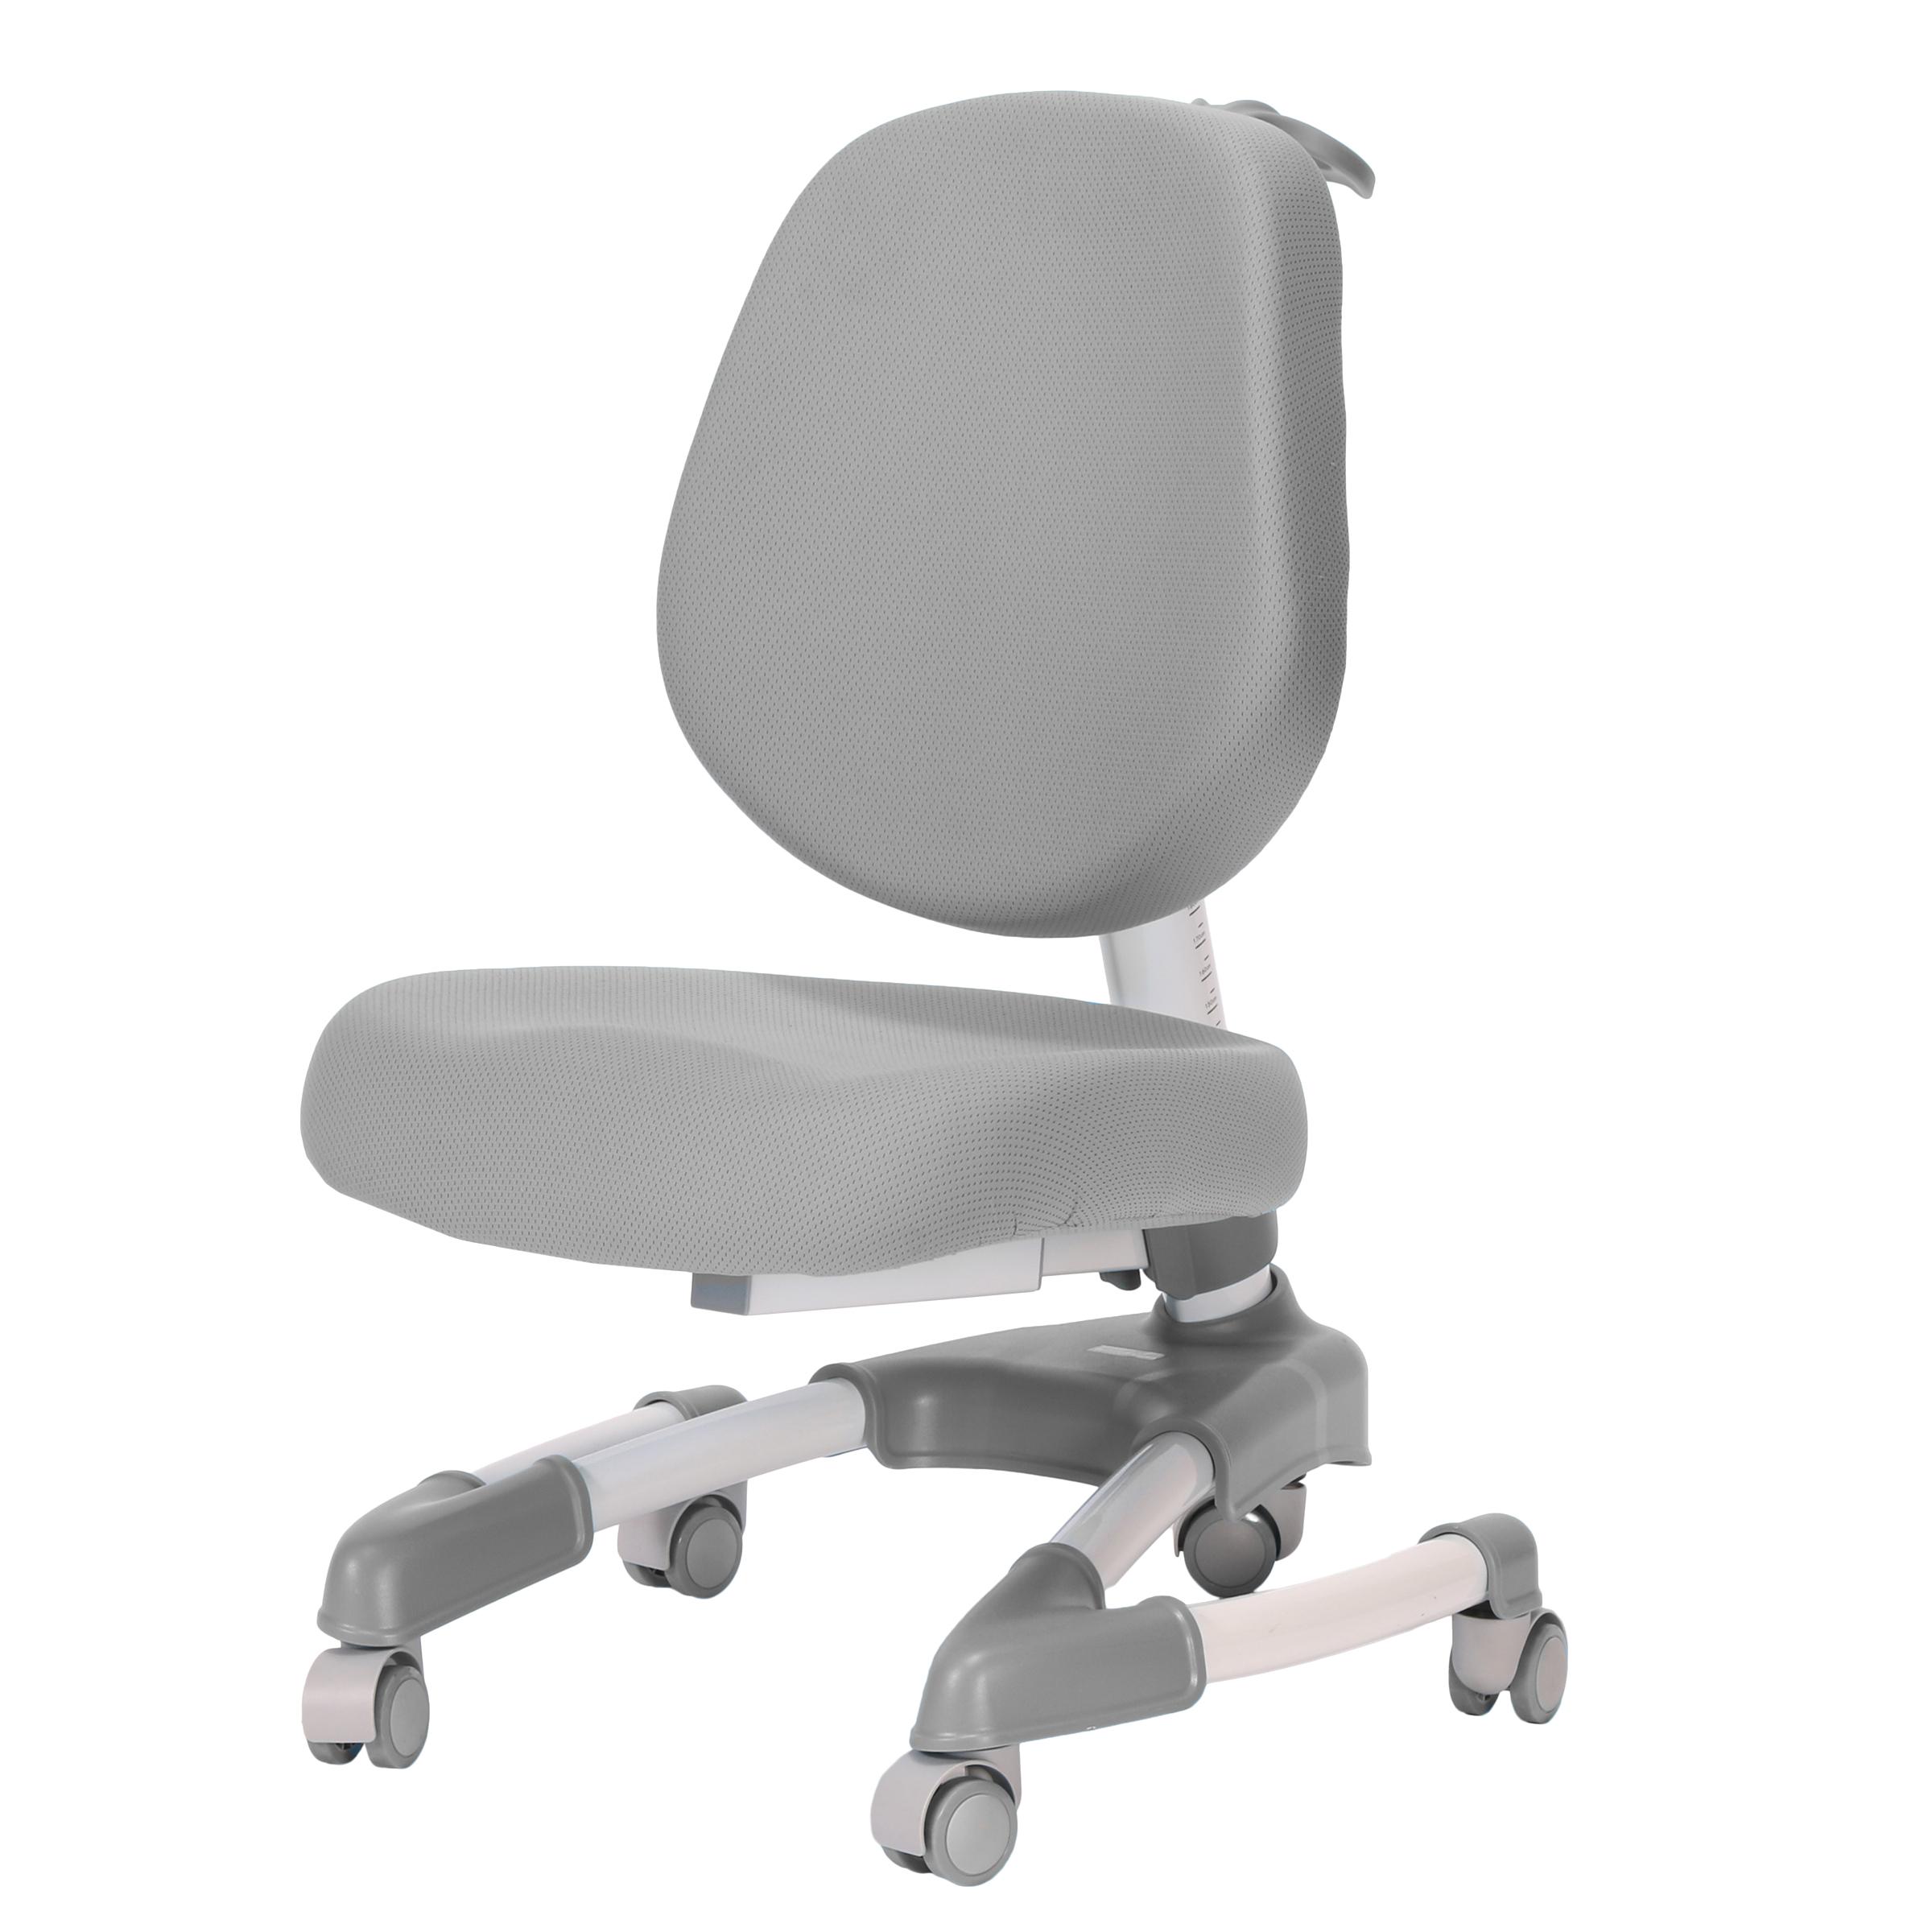 fundesk Детское кресло Buono Grey, Fundesk (Buono Grey)